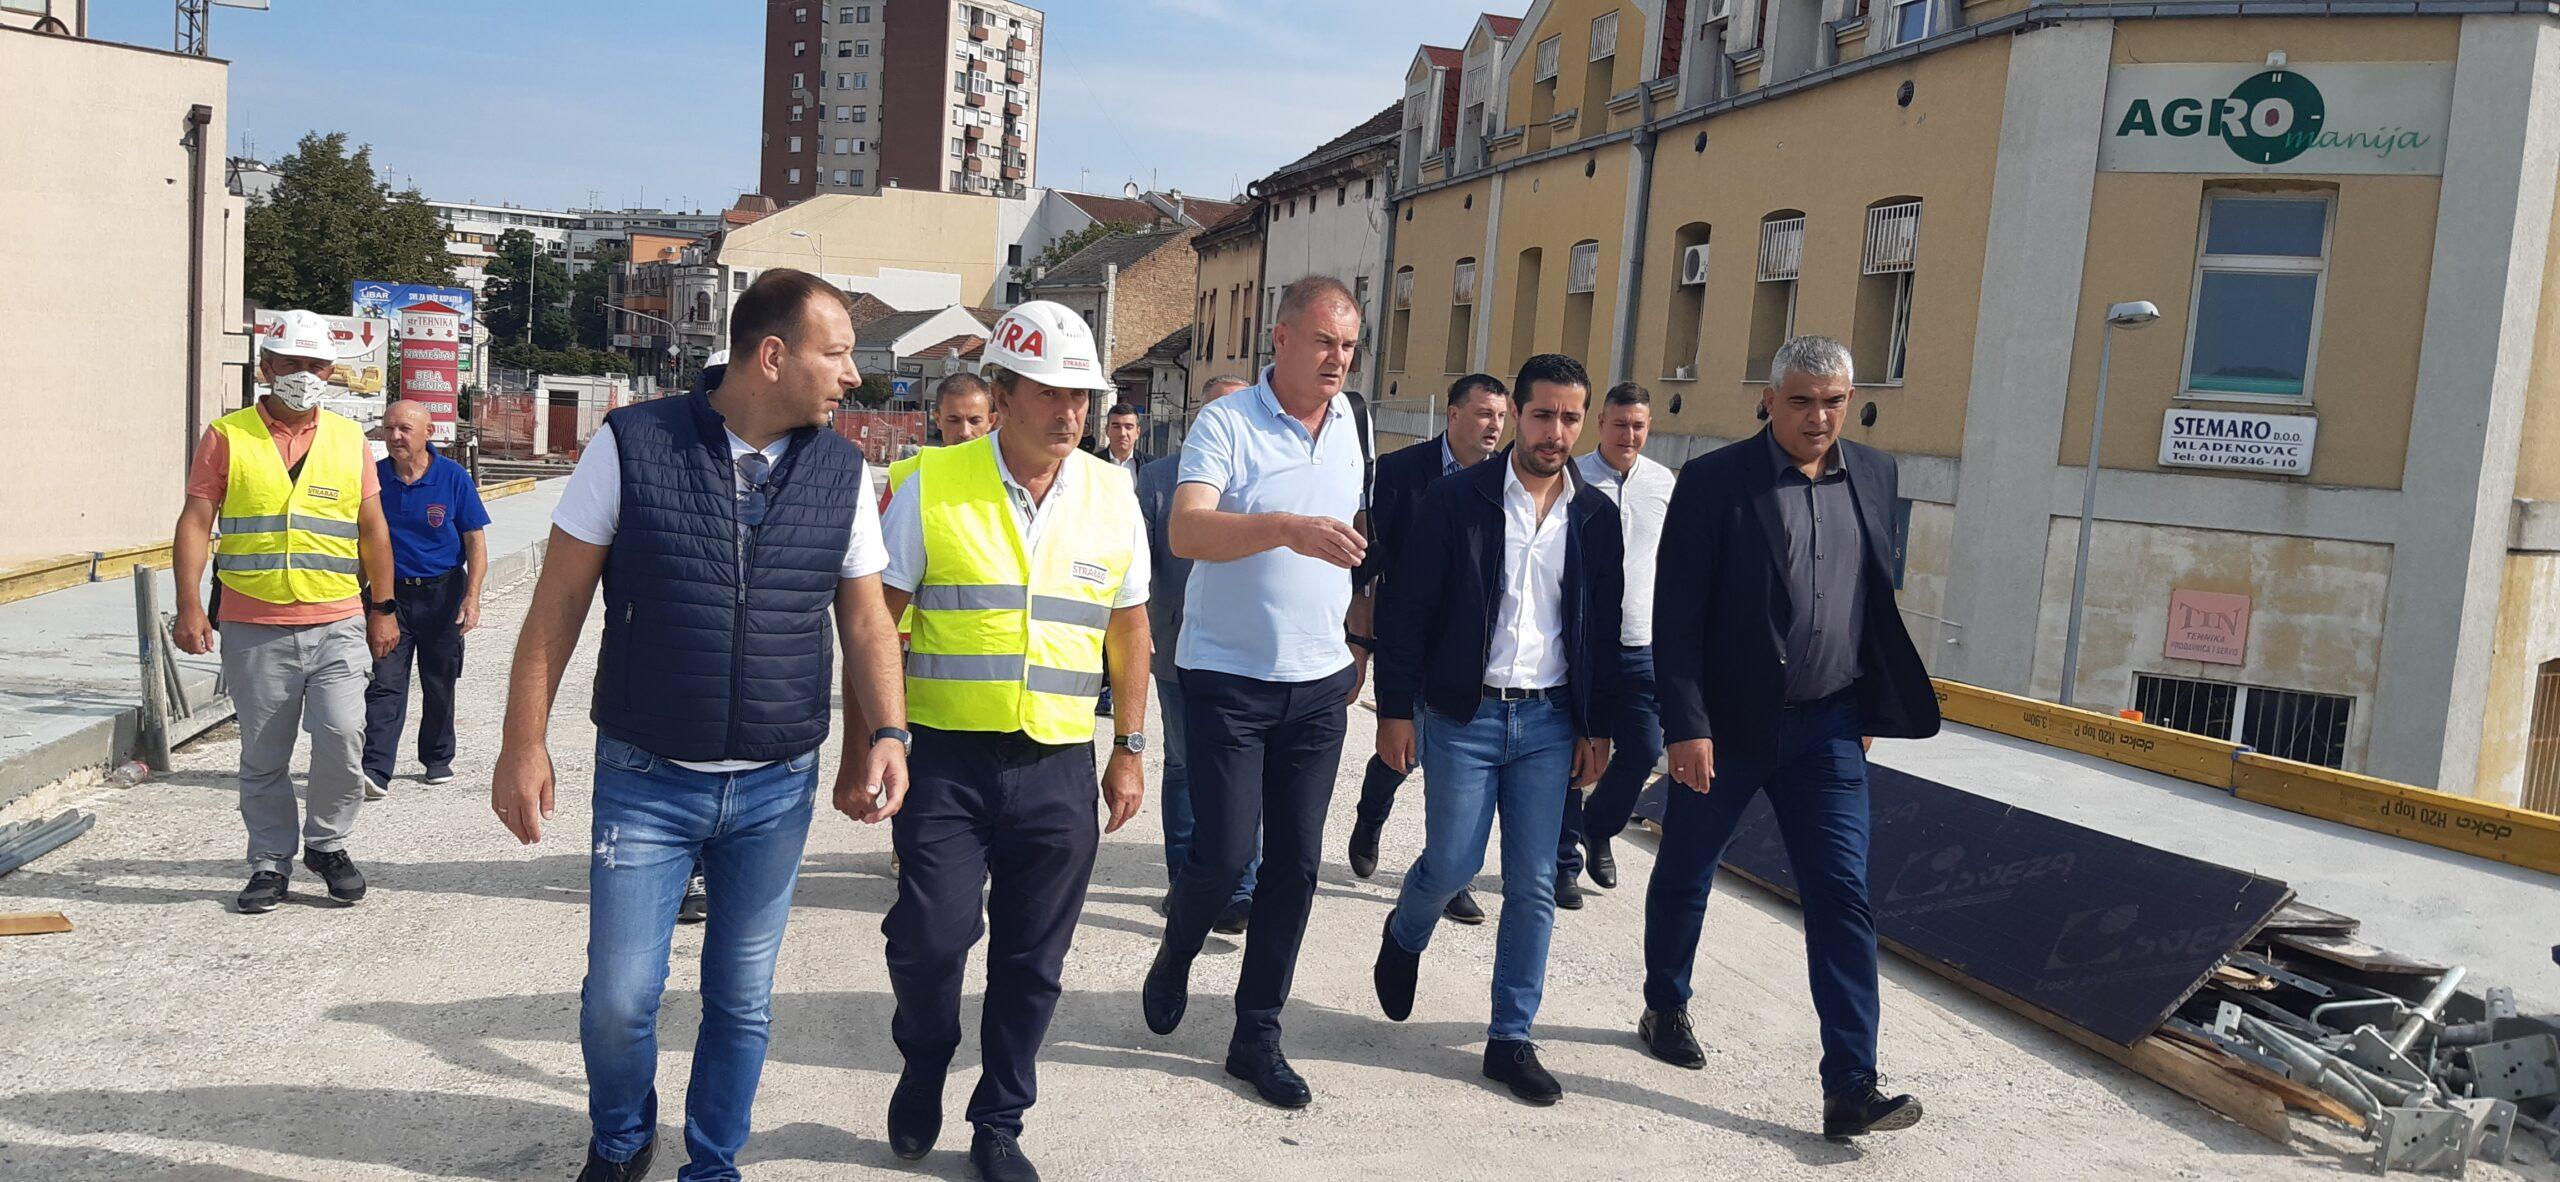 Ministar Tomislav Momirović obišao izvođenje radova na mladenovačkom nadvožnjaku (video)